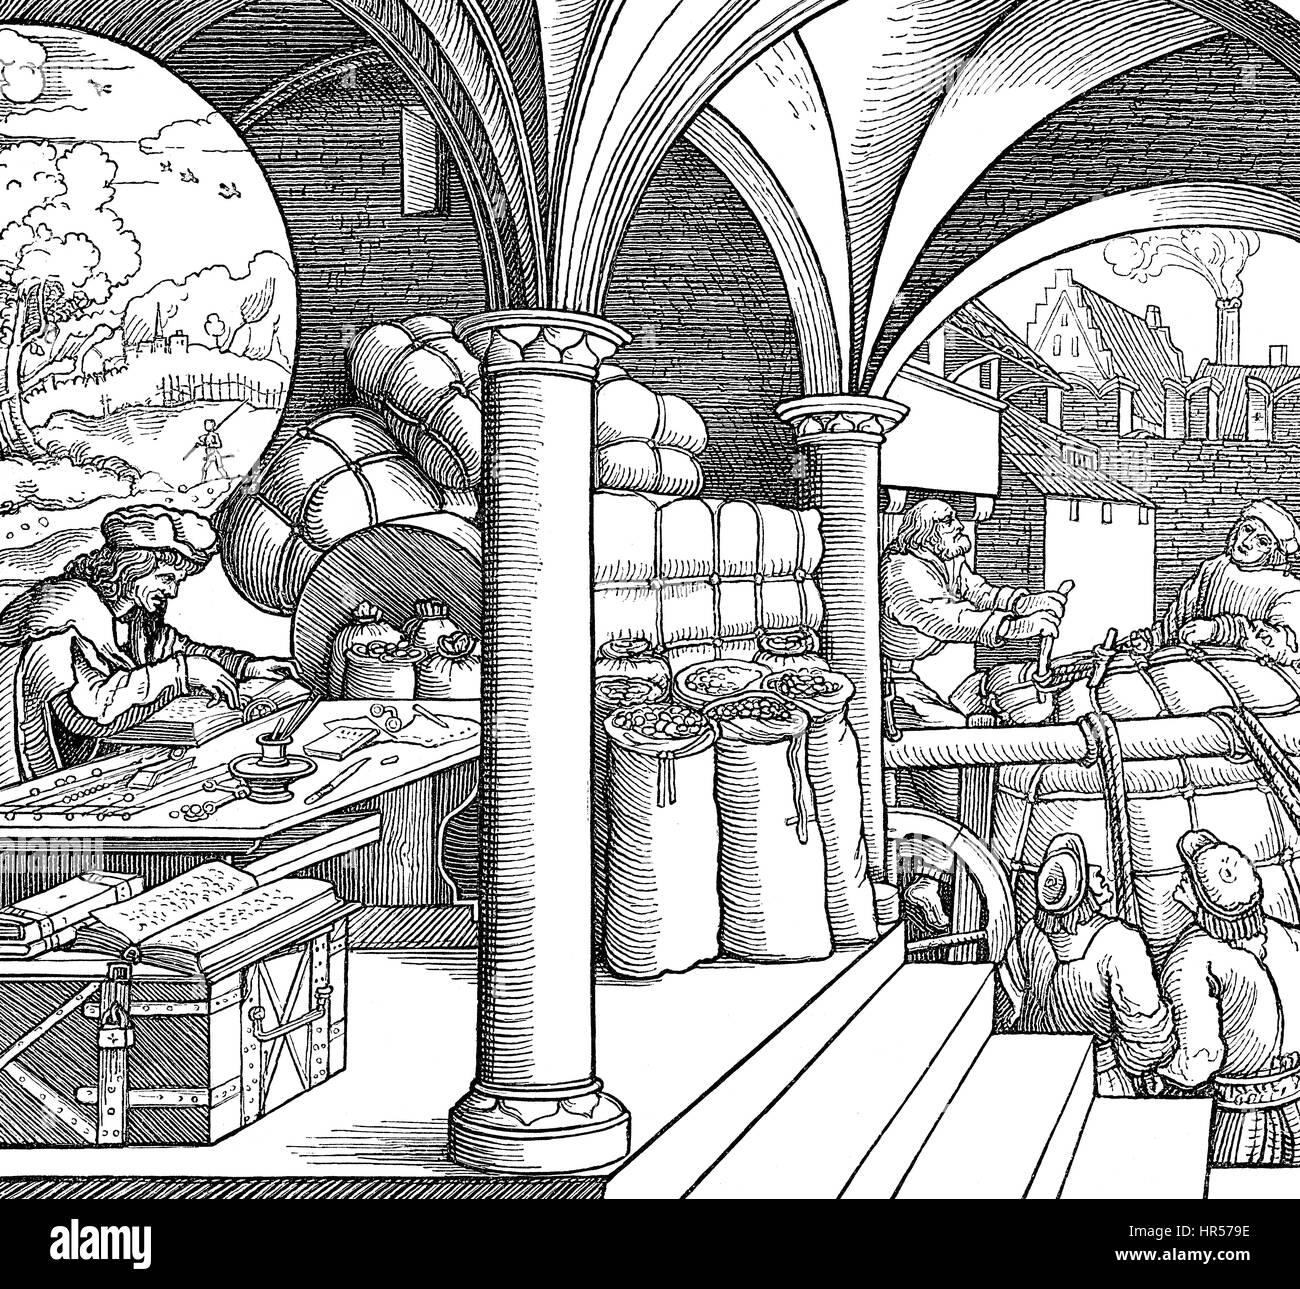 German department store, 16th century - Stock Image